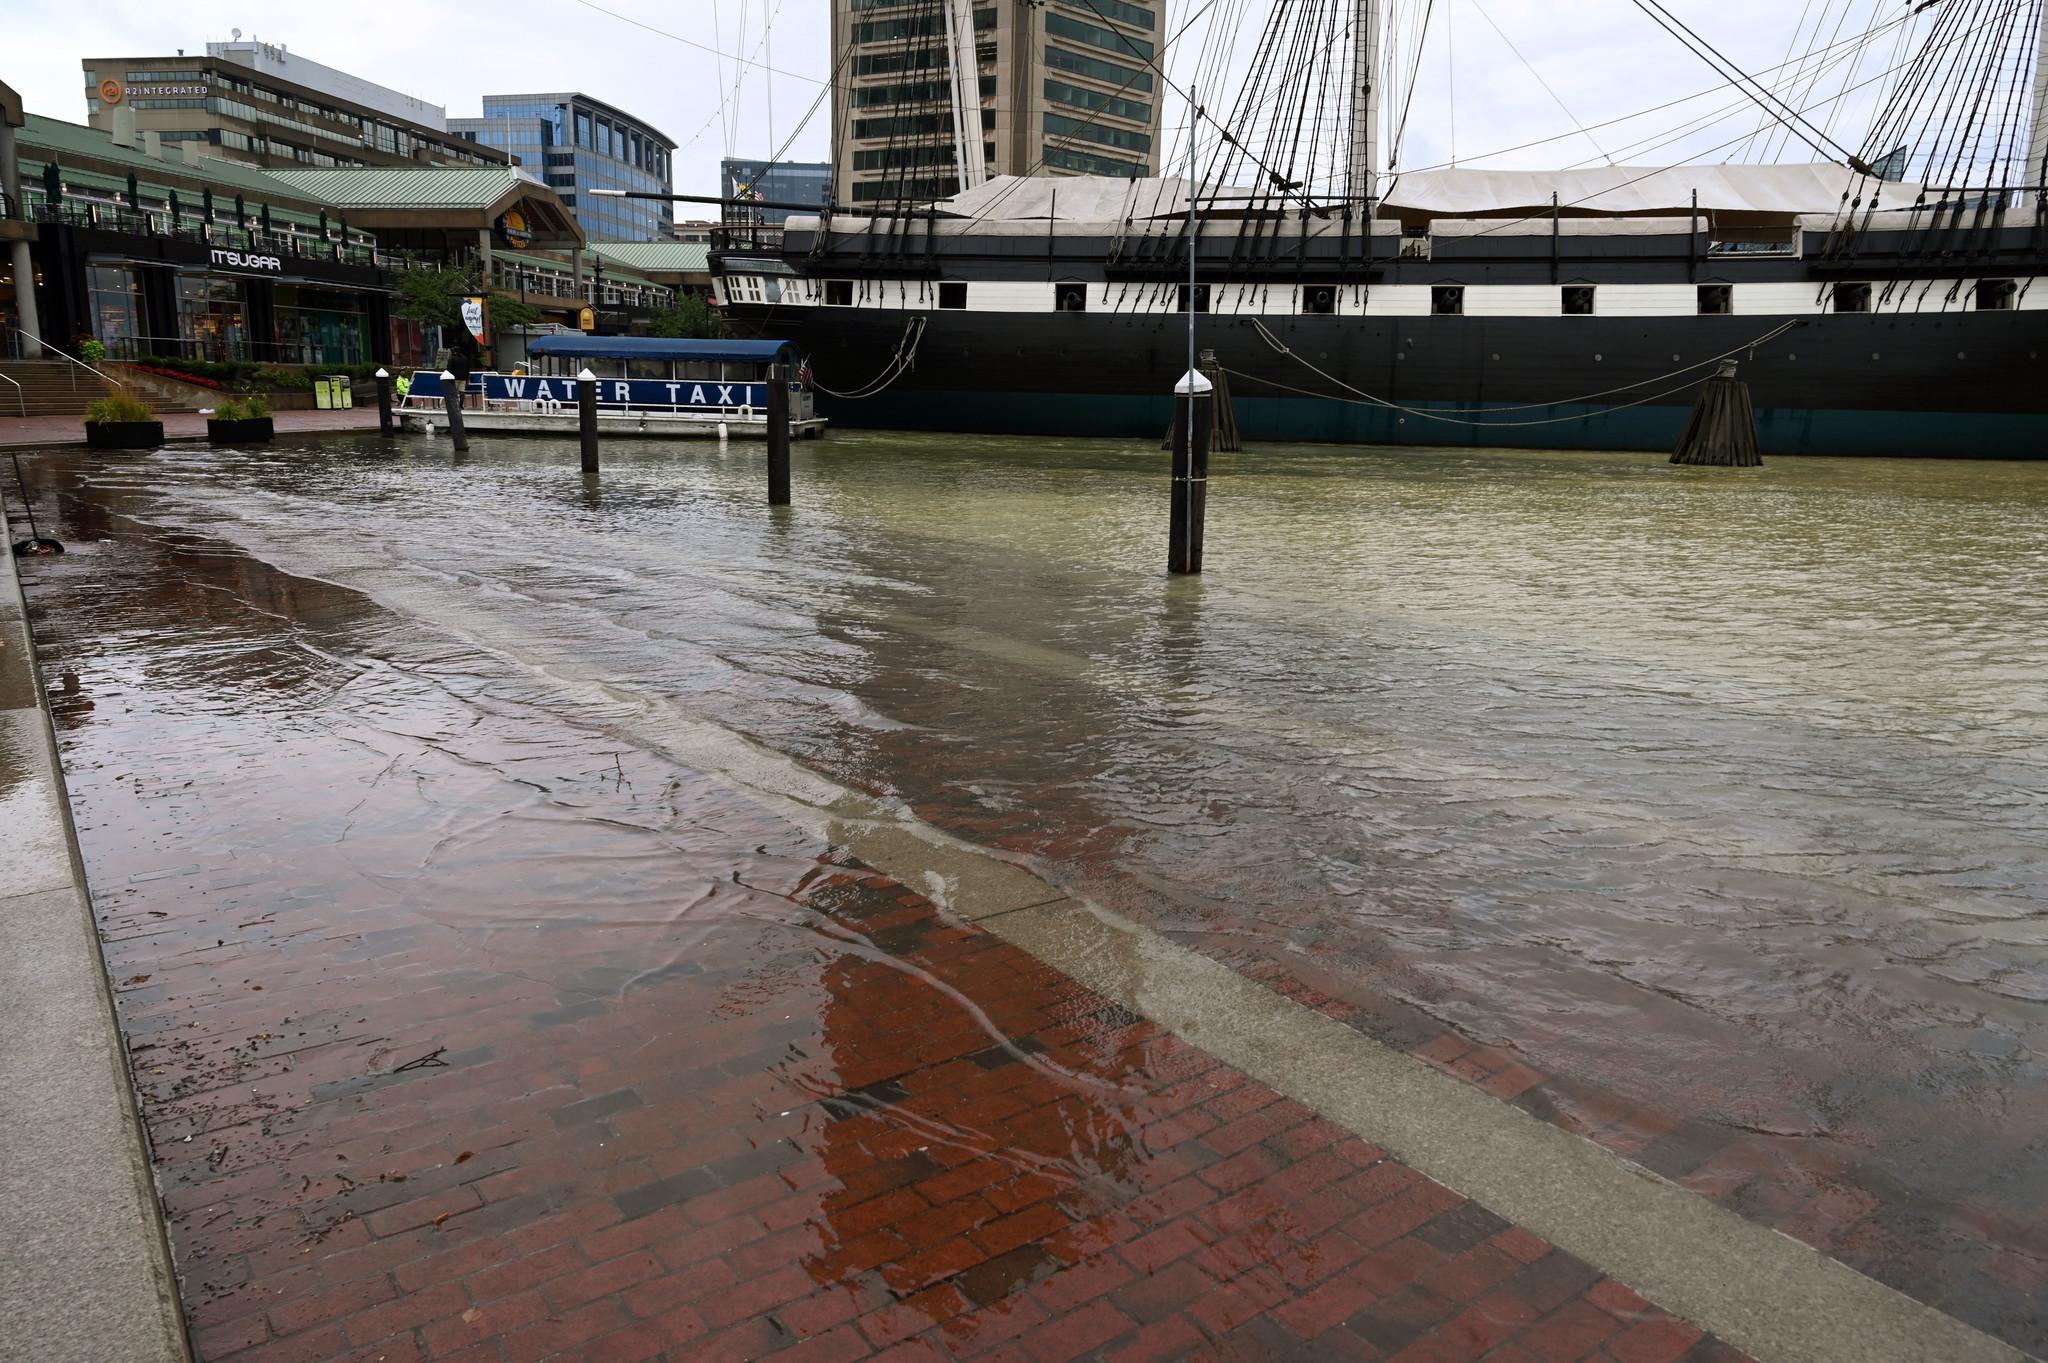 Water main break floods Inner Harbor, causes train derailment; worker injured in nearby storm drain